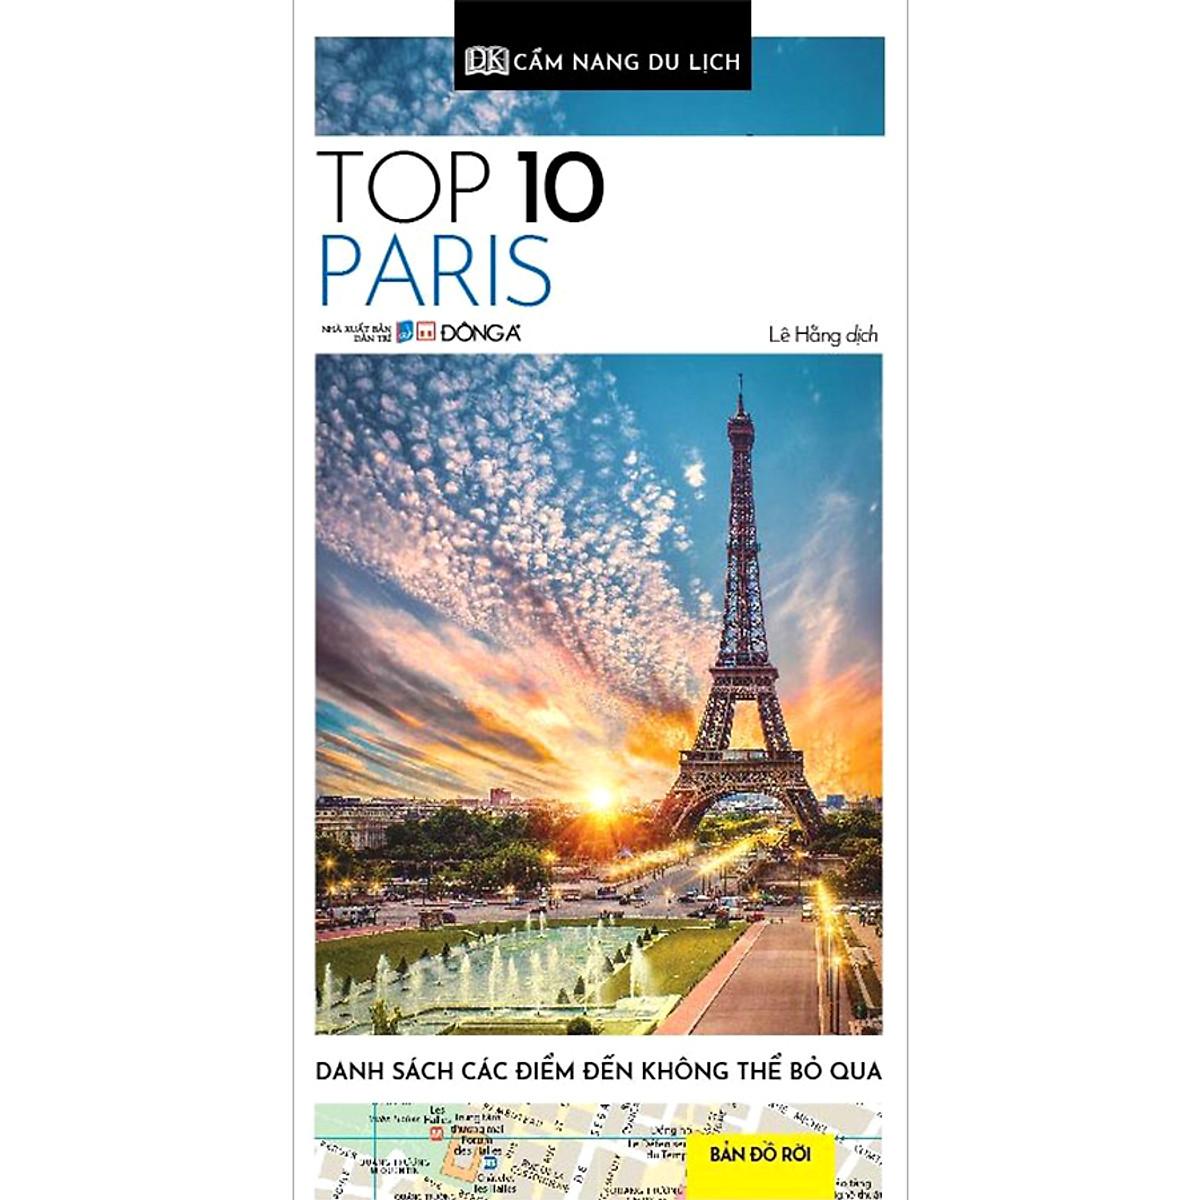 Mua Cẩm Nang Du Lịch - Top 10 Paris